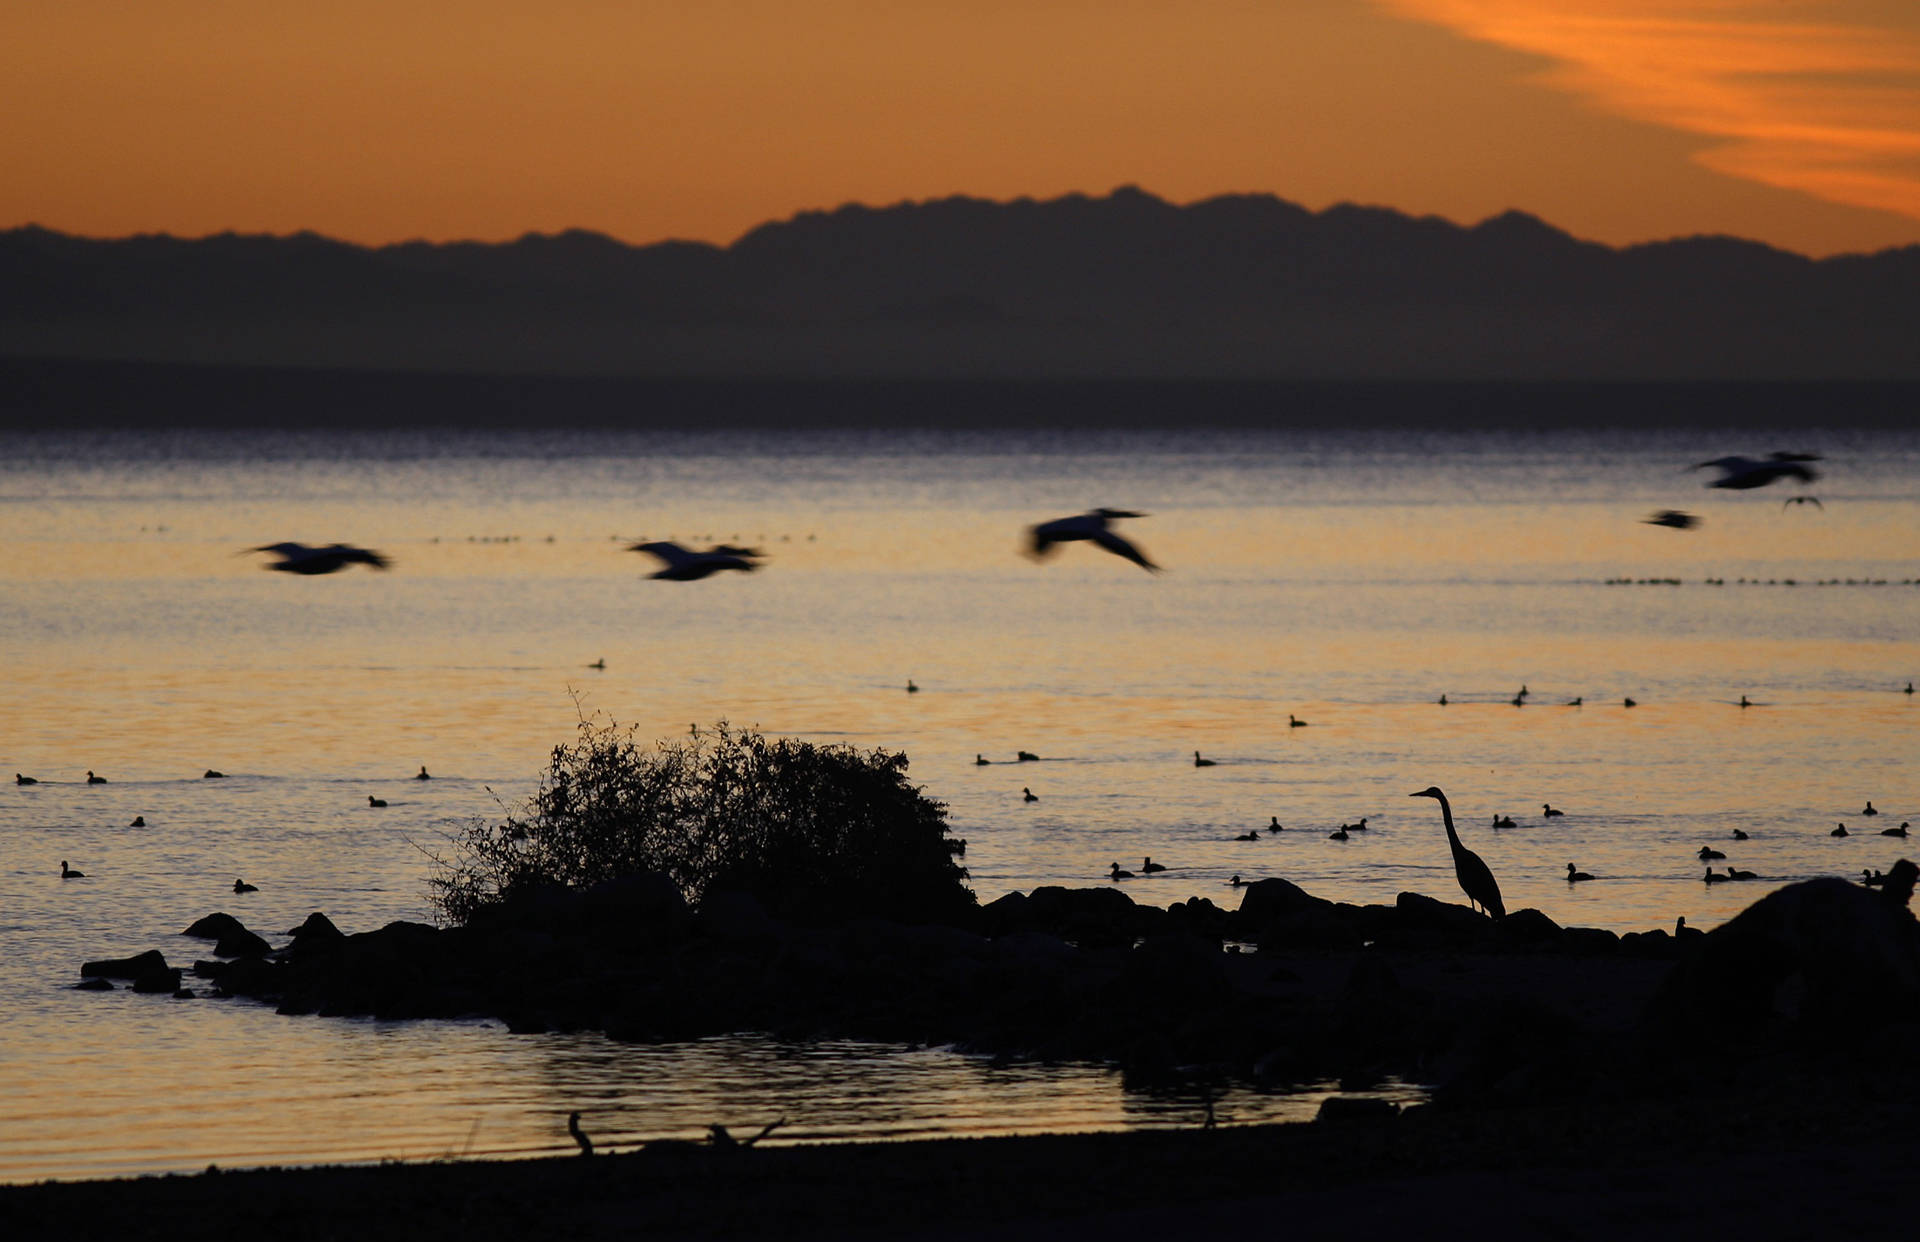 California Lawmakers Propose $3 Billion Bond Measure for State, Local Parks